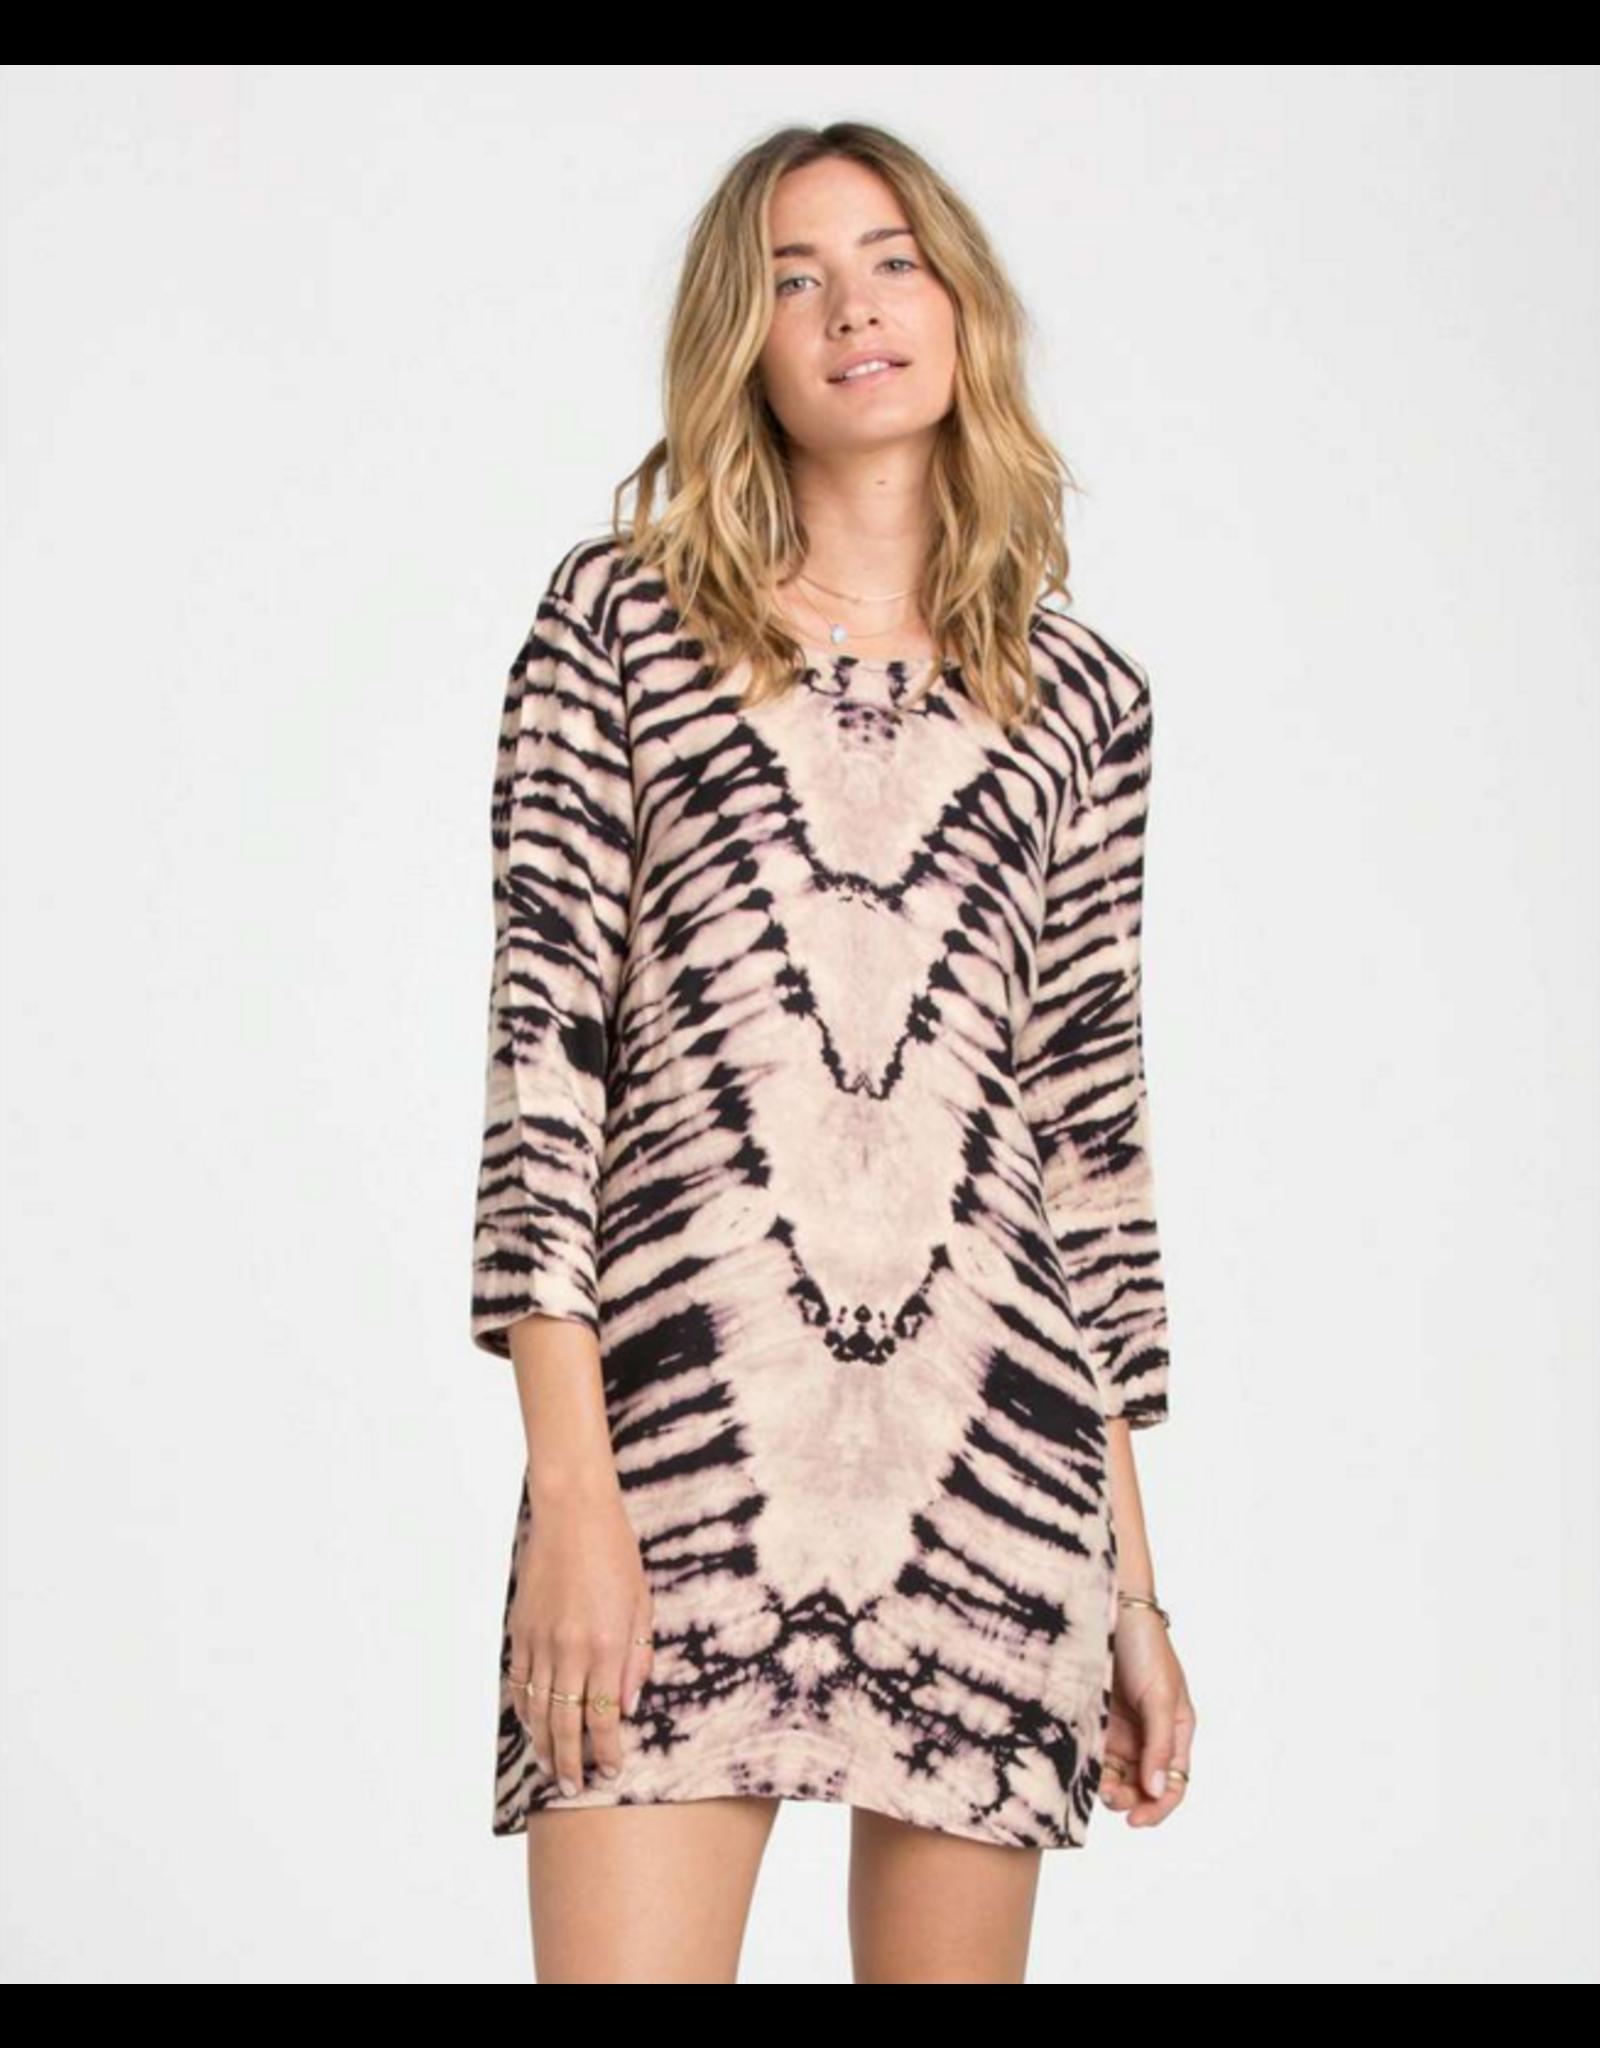 BILLABONG GYPSY DAZE DRESS